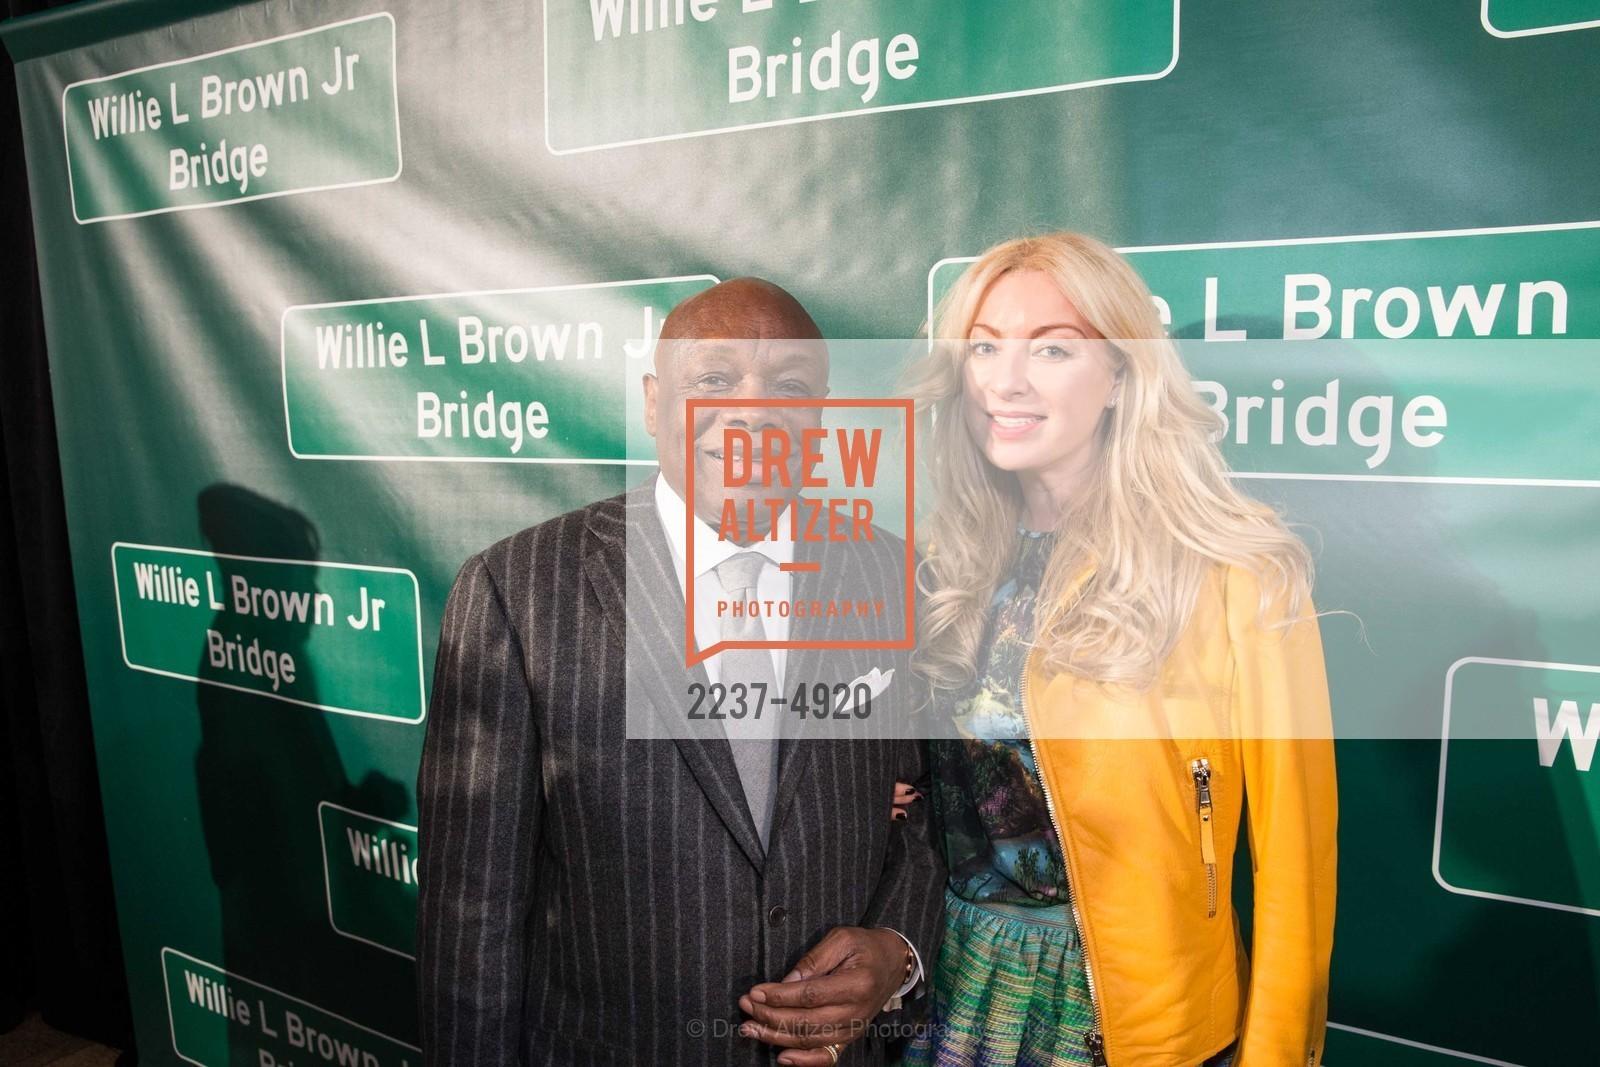 Willie Brown, Sonya Molodetskaya, Photo #2237-4920